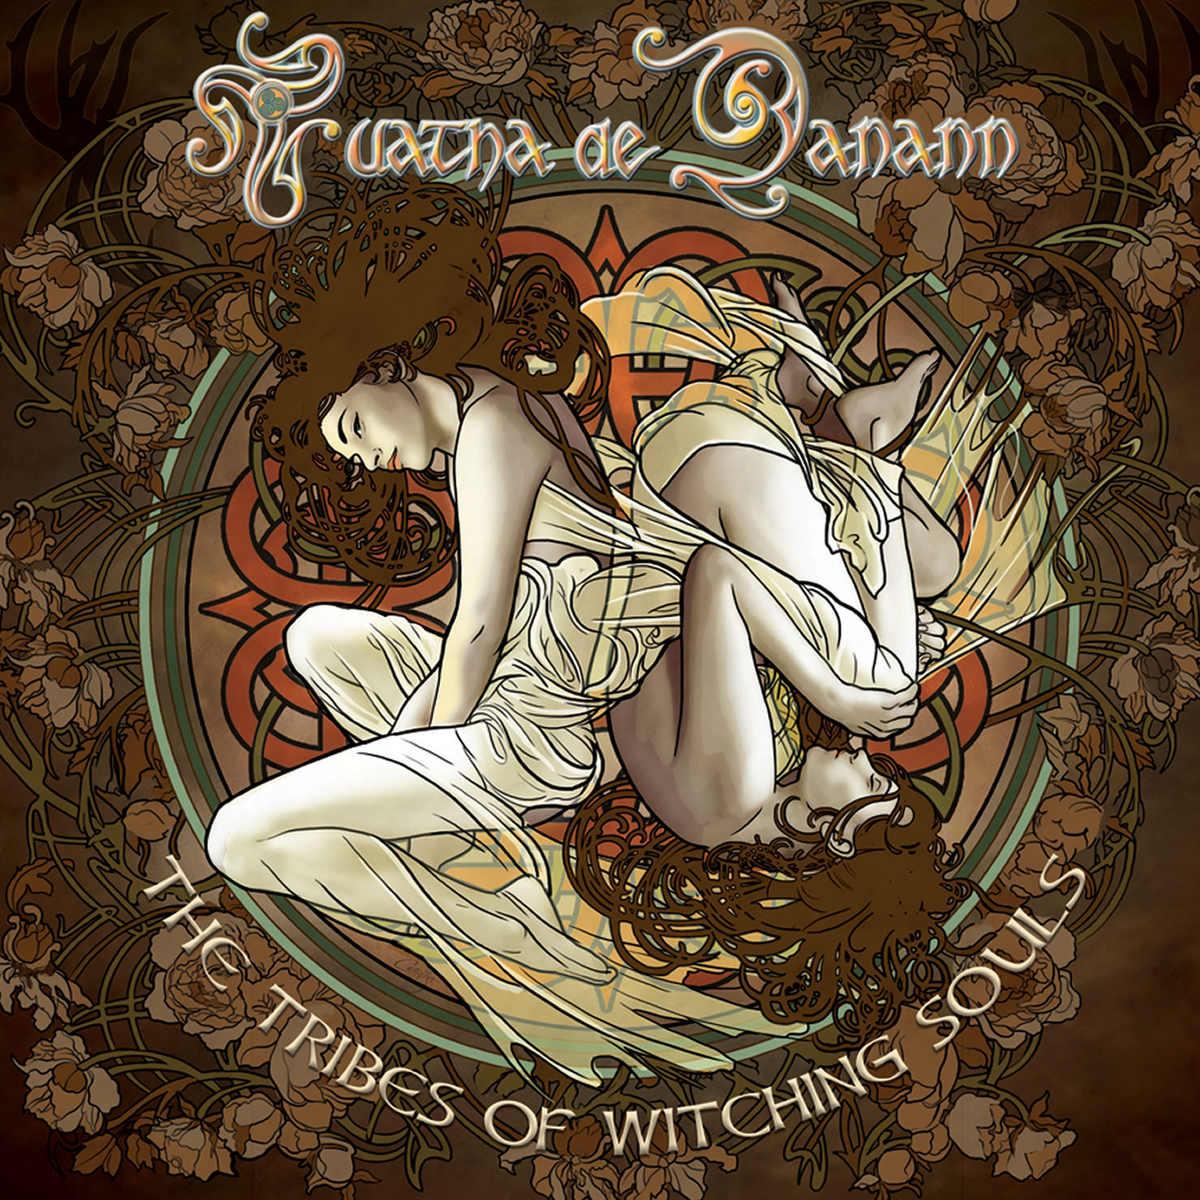 "tuatha-de-danann:-neues-folk-metal-/-rock-album-""the-tribes-of-witching-souls""-aus-brasilien"